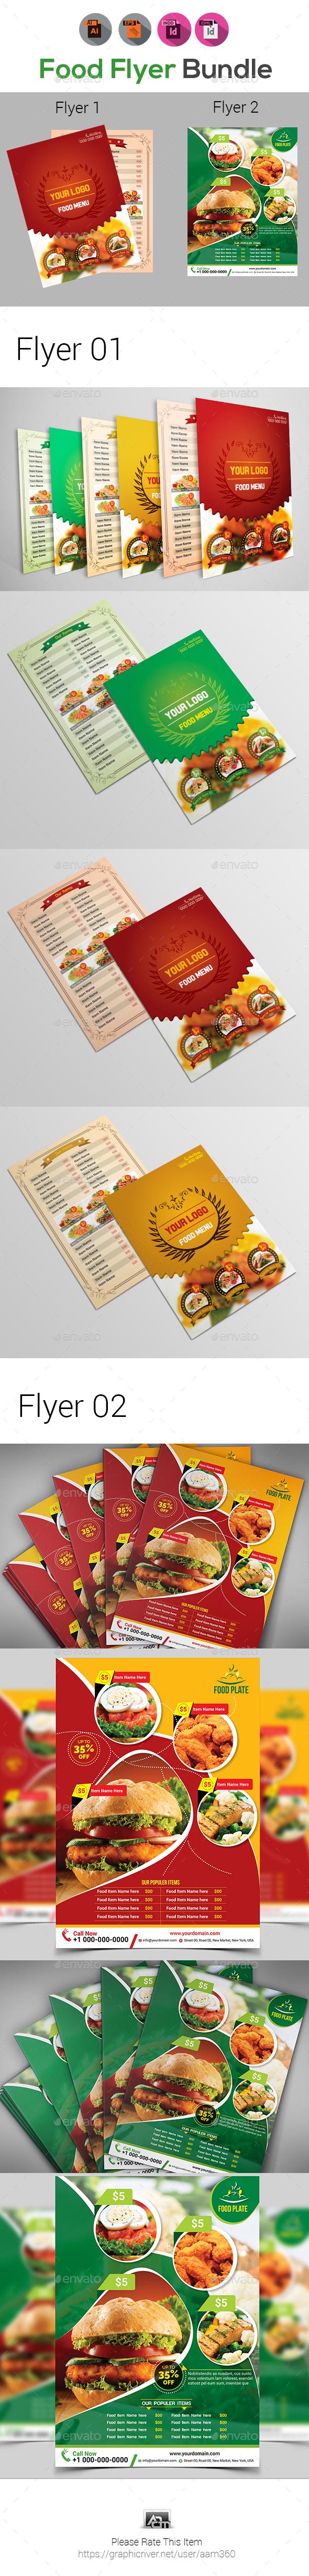 Menu or Food Flyer Templates - Restaurant Flyers